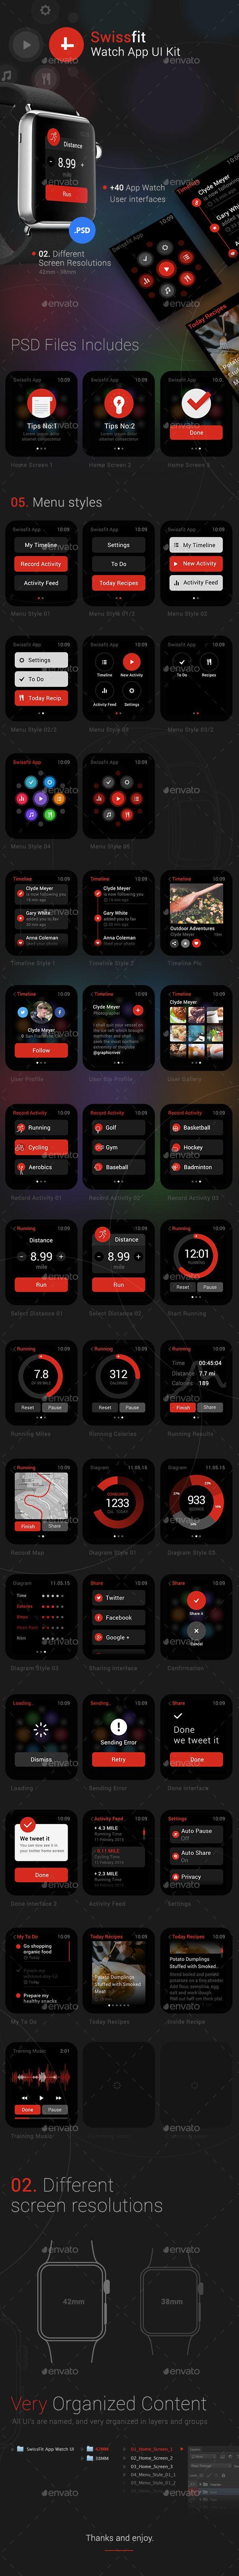 Swissfit Watch App User Interface Kit Template #design #ui Download: http://graphicriver.net/item/swissfit-watch-app-ui-kit/11382356?ref=ksioks